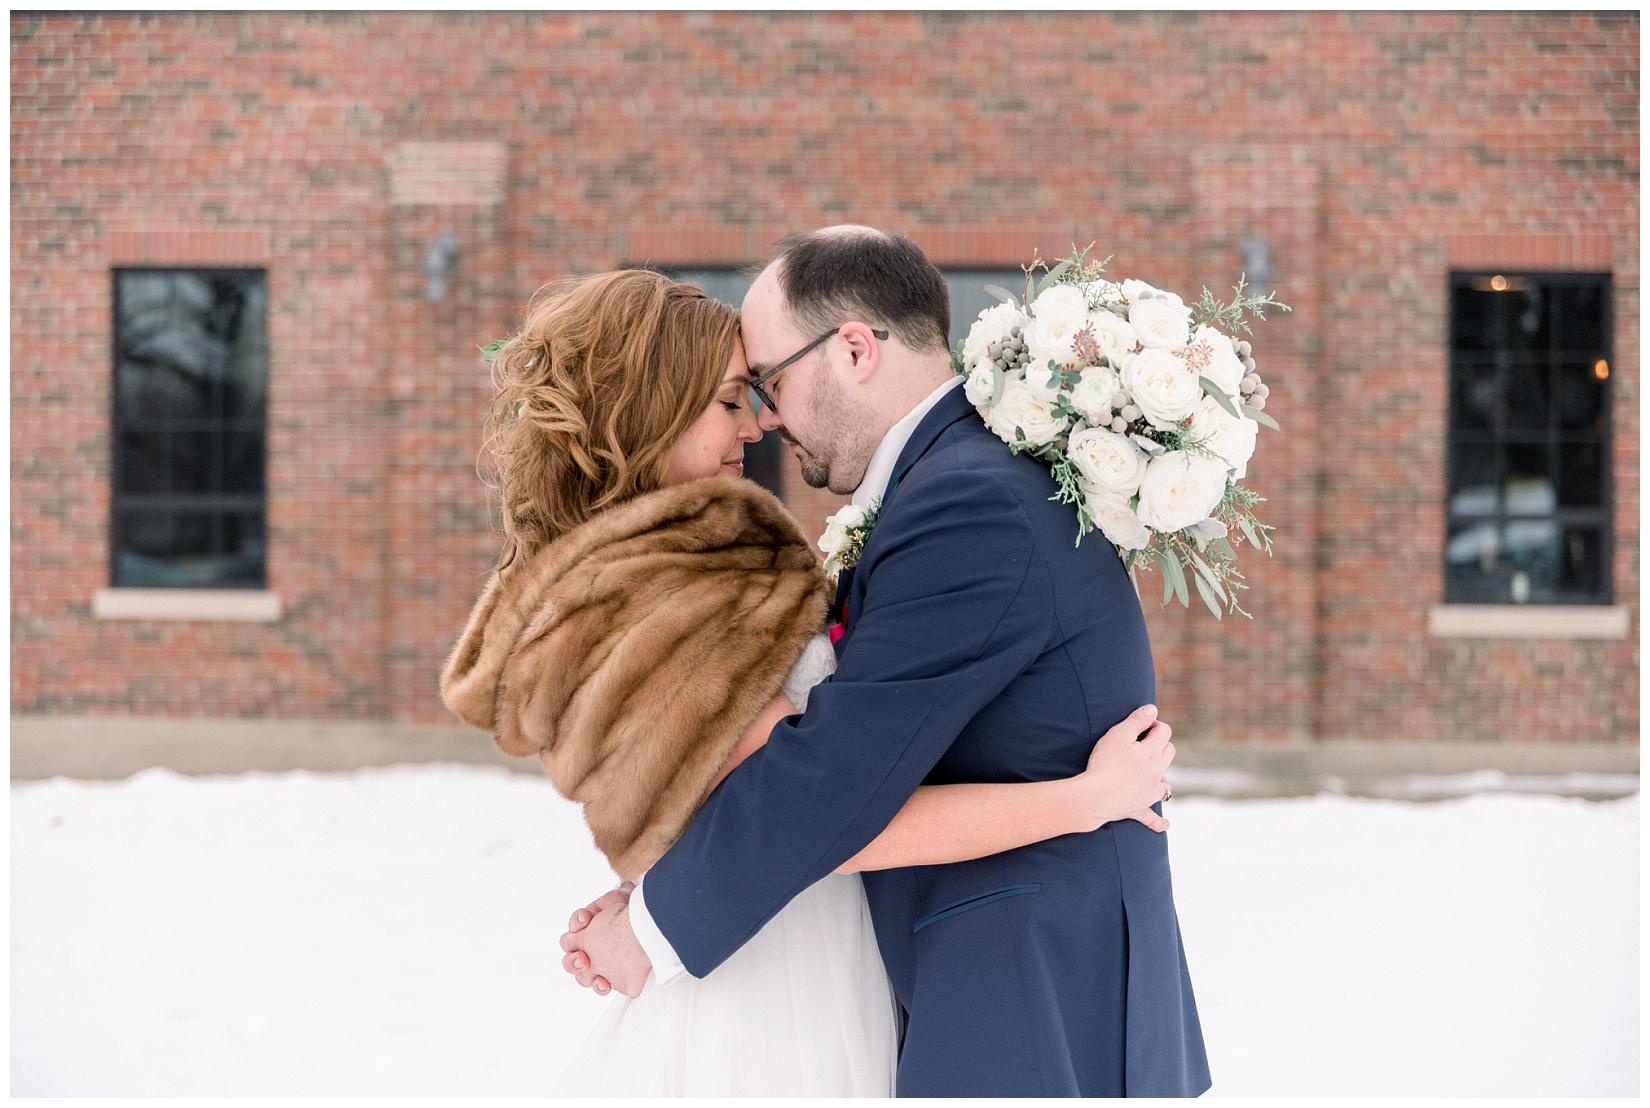 cat-alkire-wedding-photographer-indiana-chicago-indianapolis-fort-wayne_0970.jpg